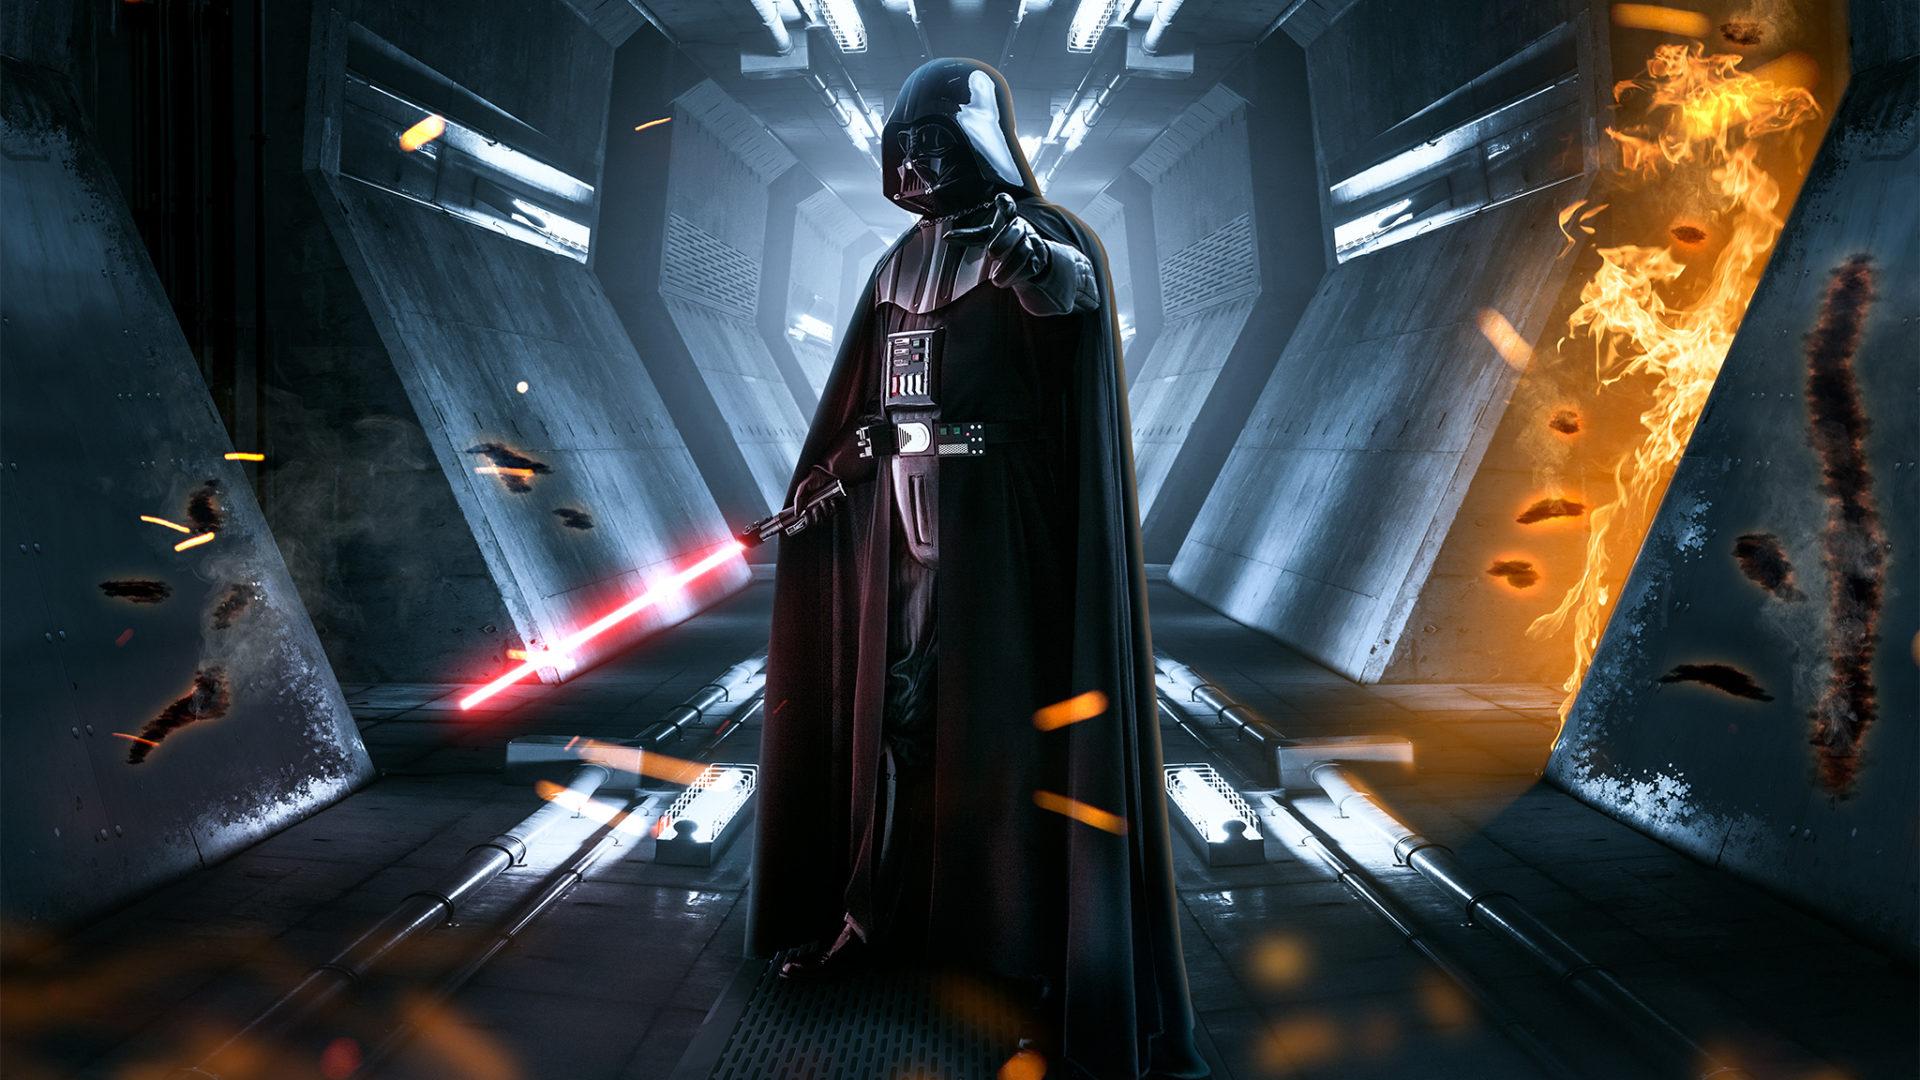 New Darth Vader Wallpapers Hd Wallpapers